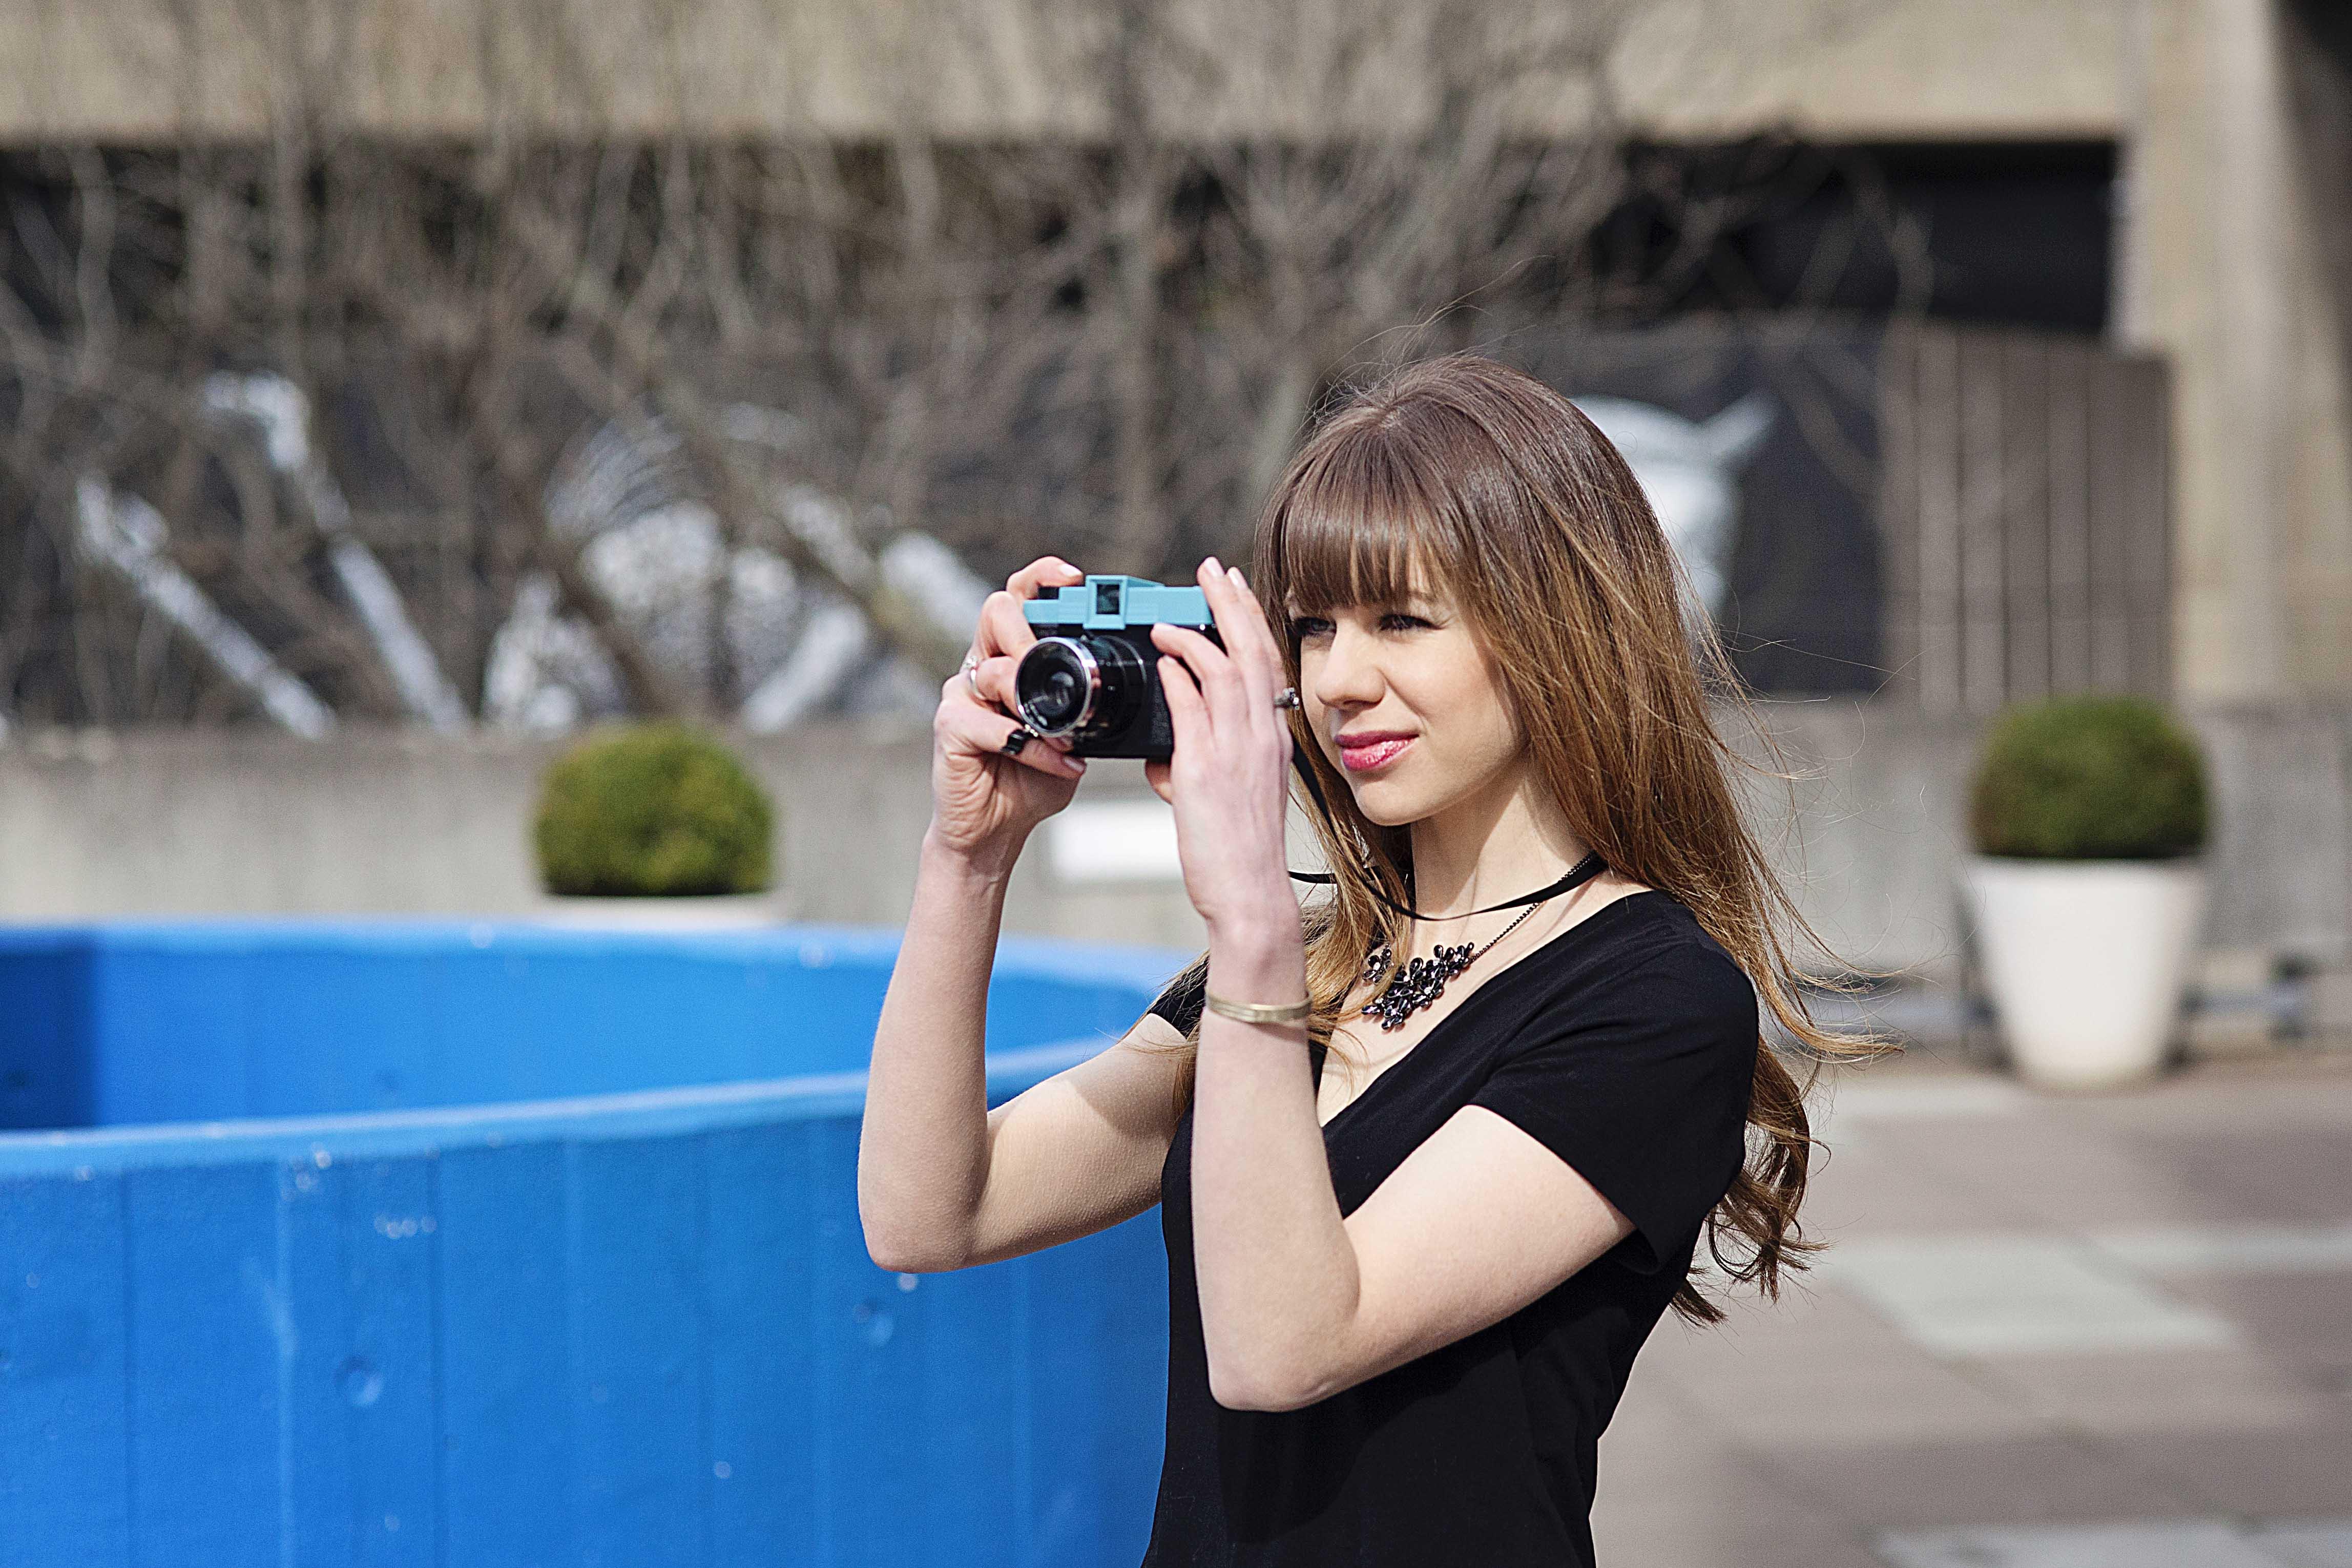 Denver online dating photographer